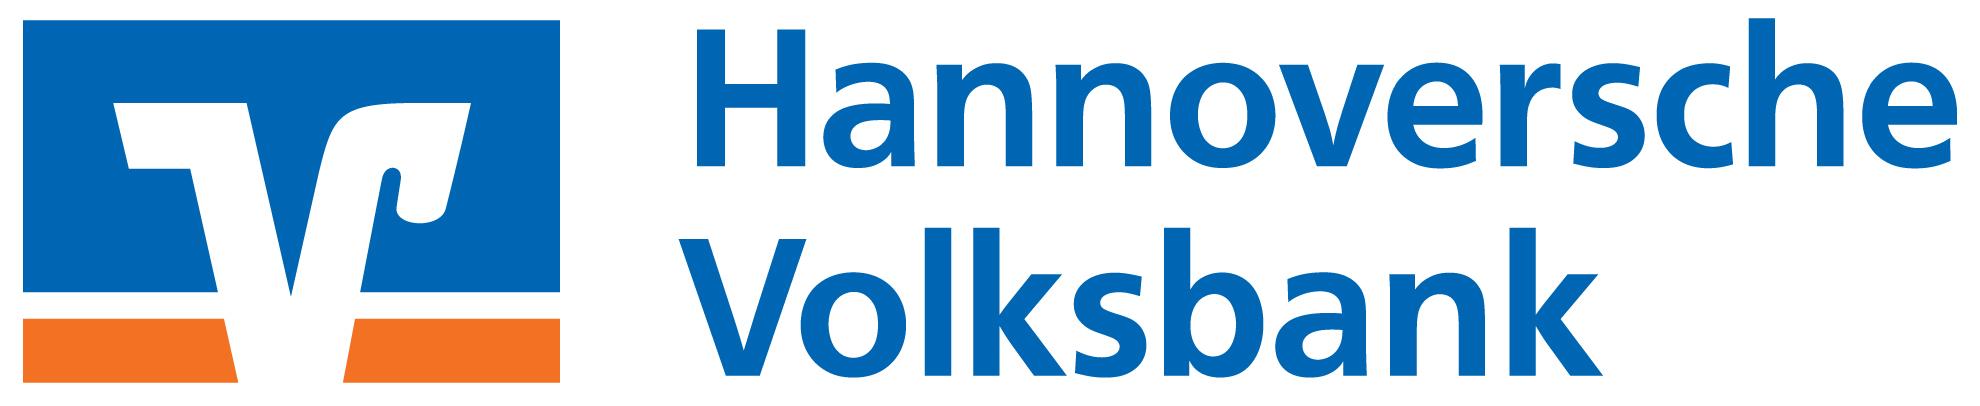 Hannoversche Volksbank eG KompetenzCenter Barsinghausen